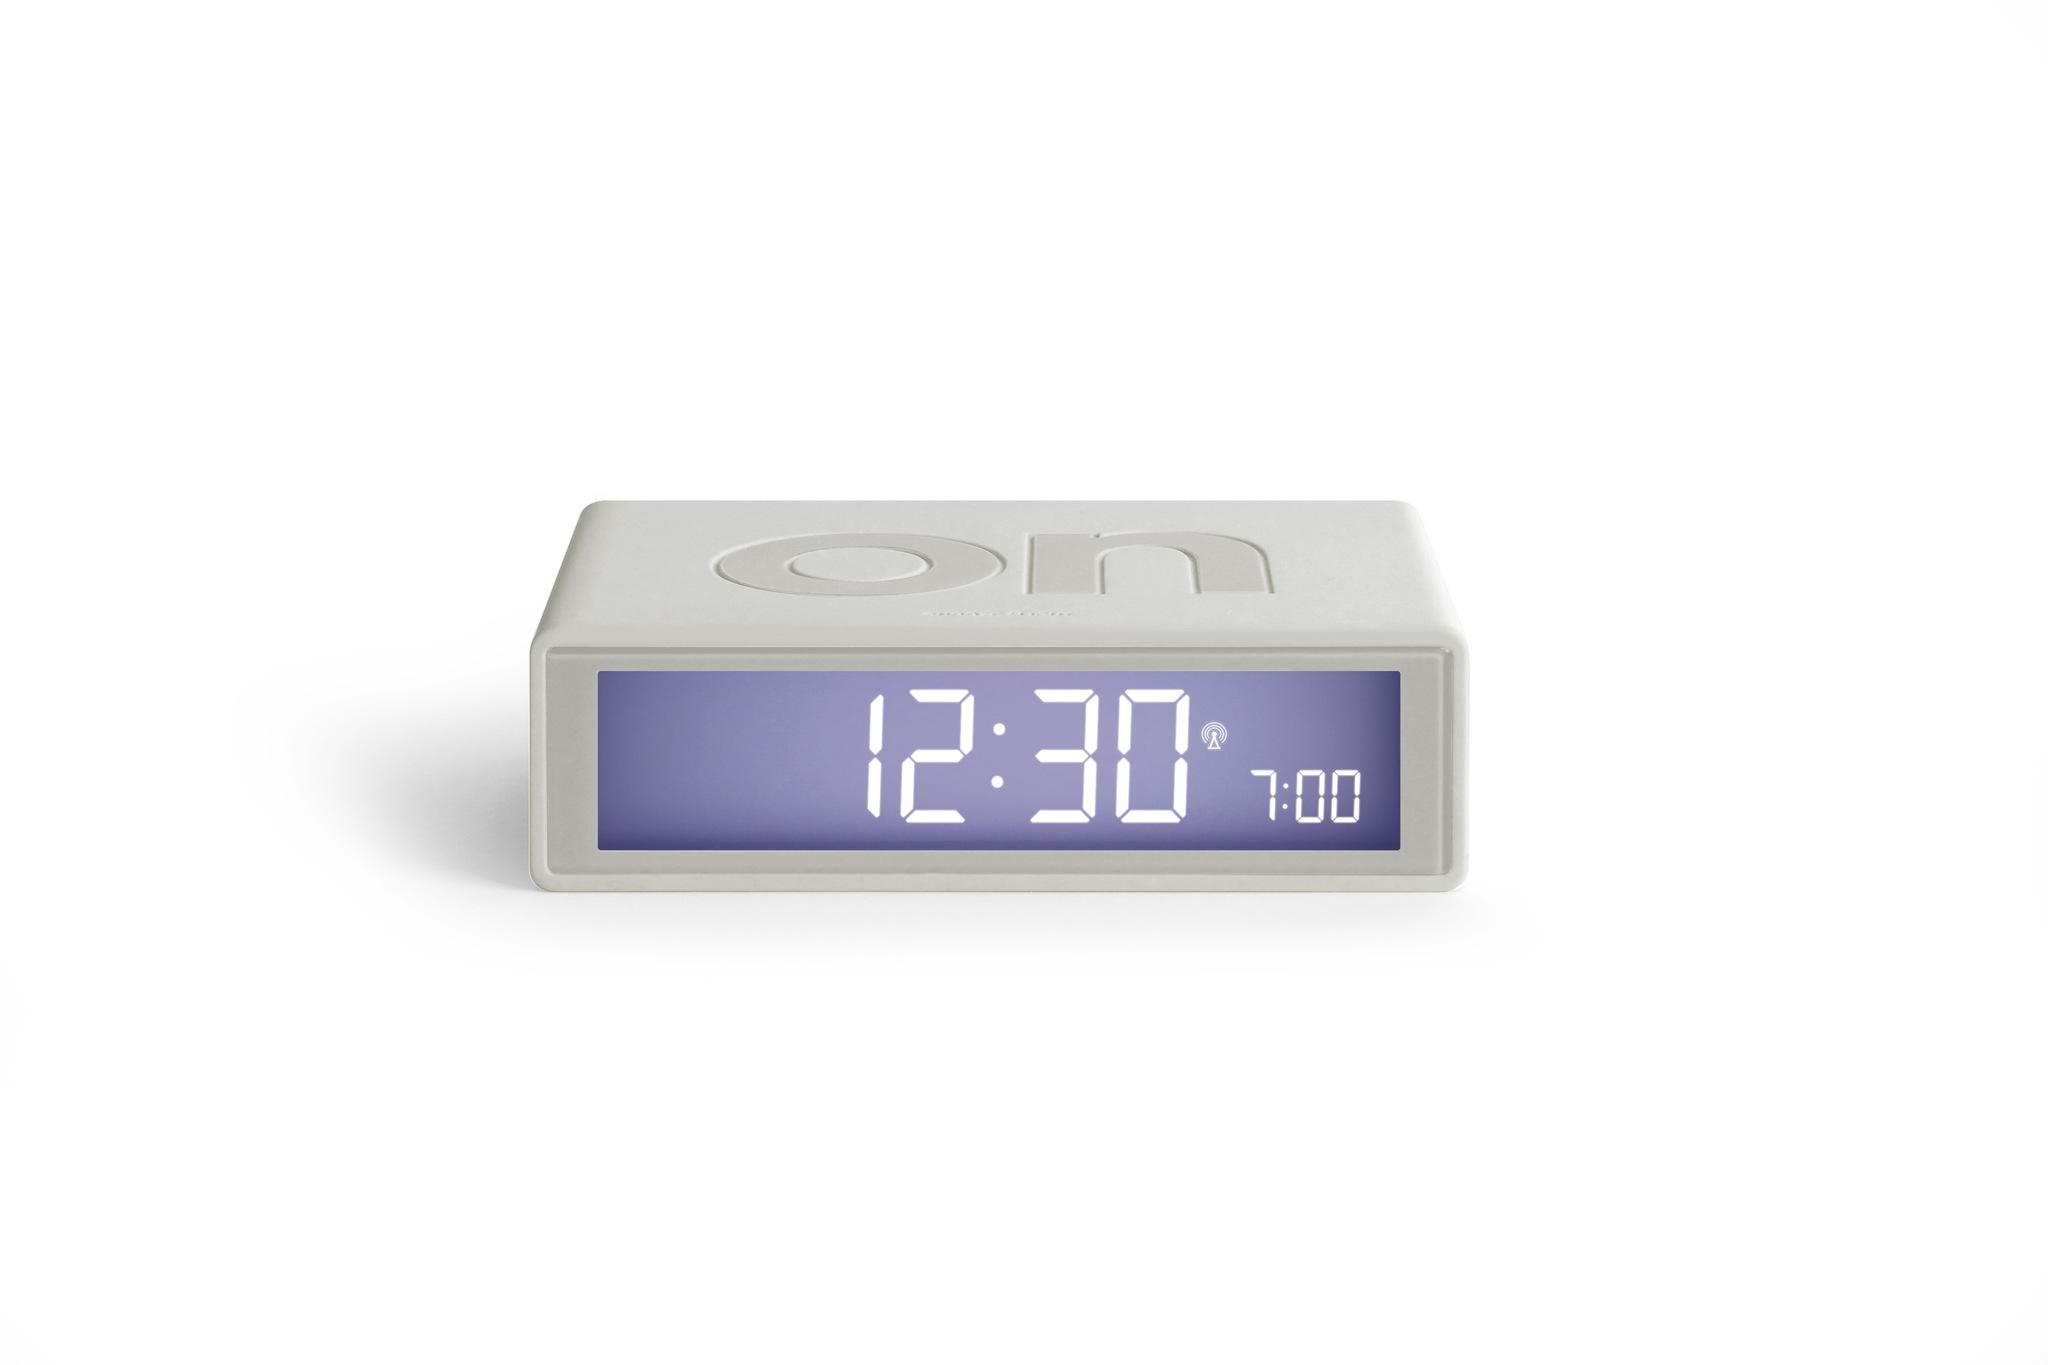 weiss, funkgesteuert, LCD Display, snooze